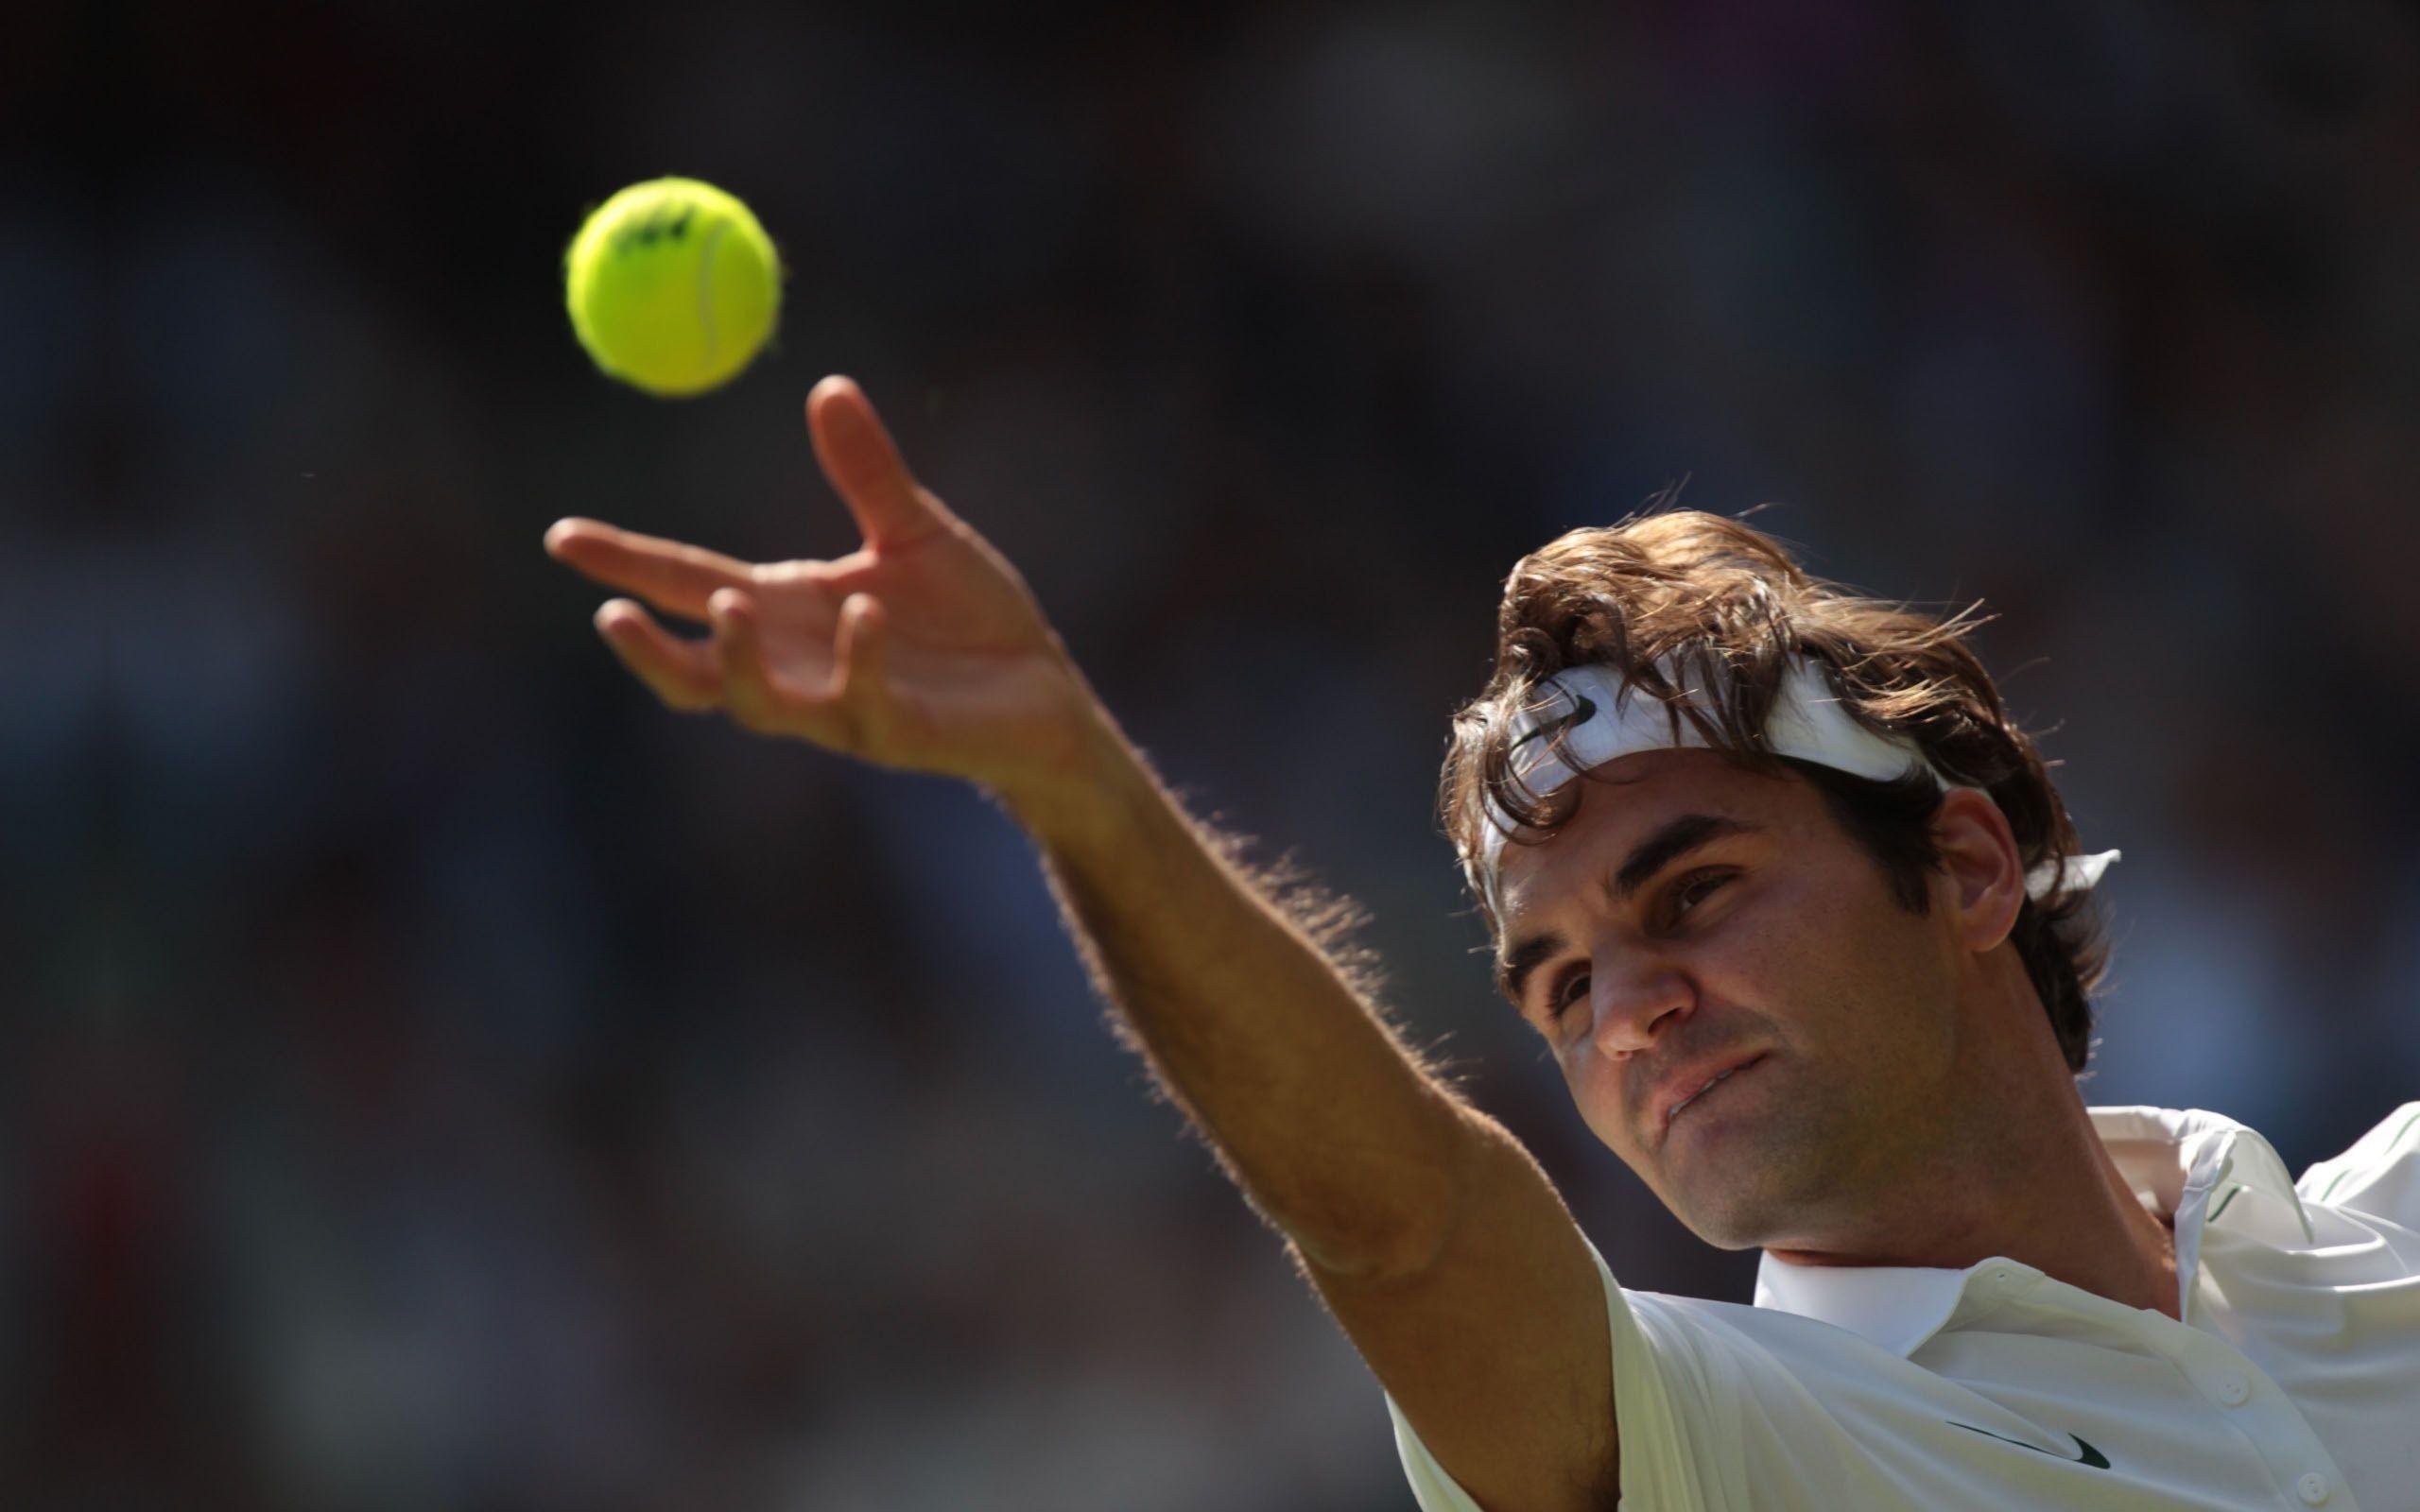 Roger Federer Serve A Tennis Ball Wallpapers Hd Wallpapers Roger Federer Sports Wallpapers Tennis Players